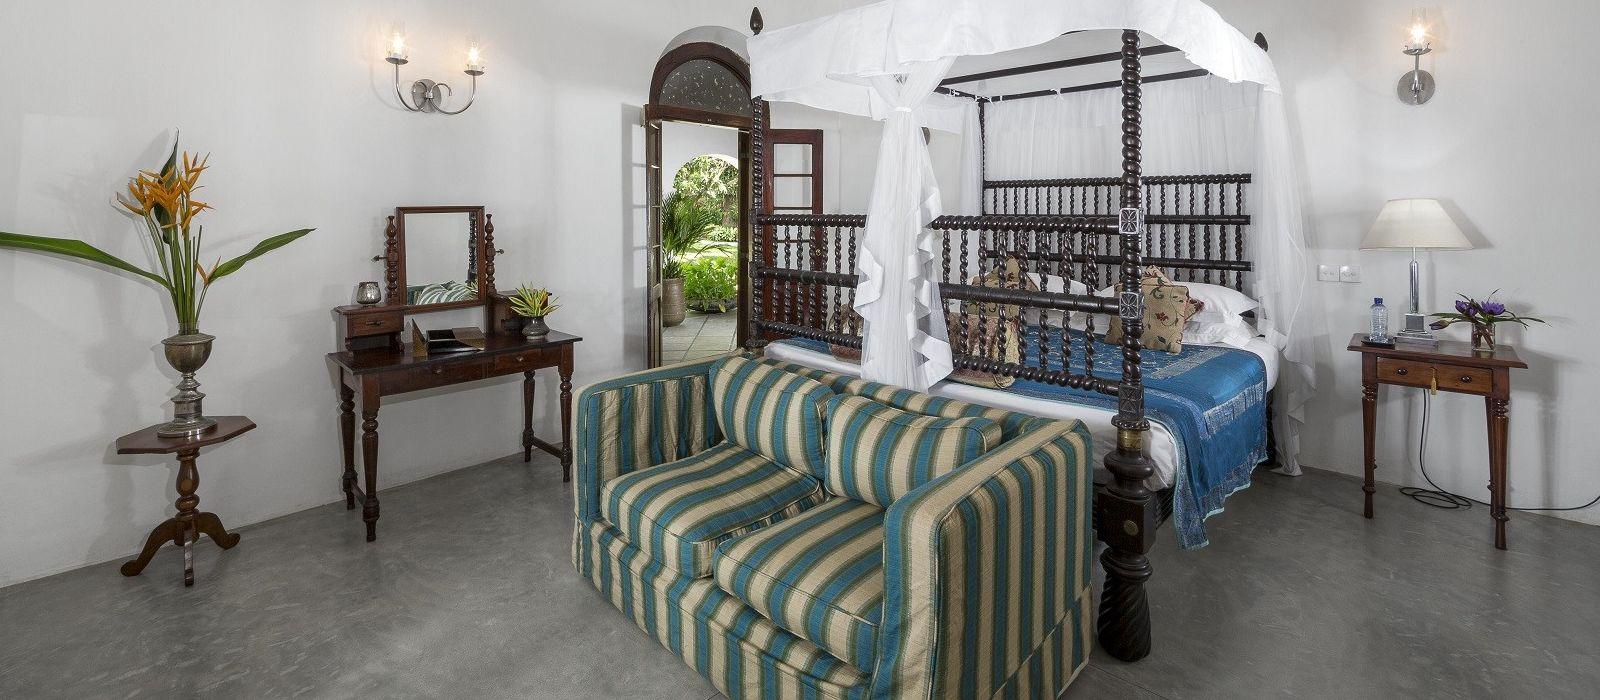 Hotel The Kandy House Sri Lanka